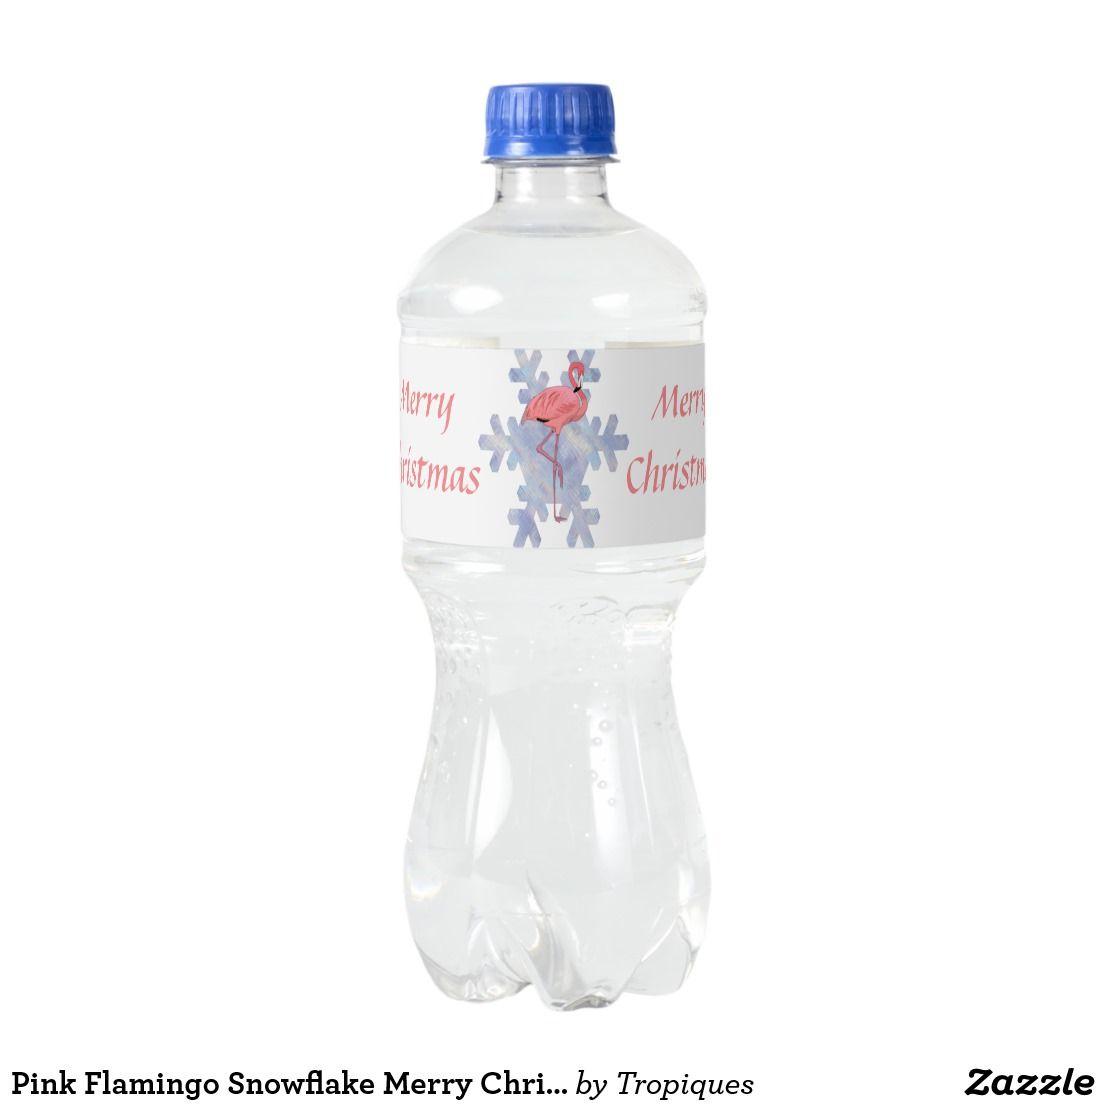 Pink Flamingo Snowflake Merry Christmas Water Bottle Label